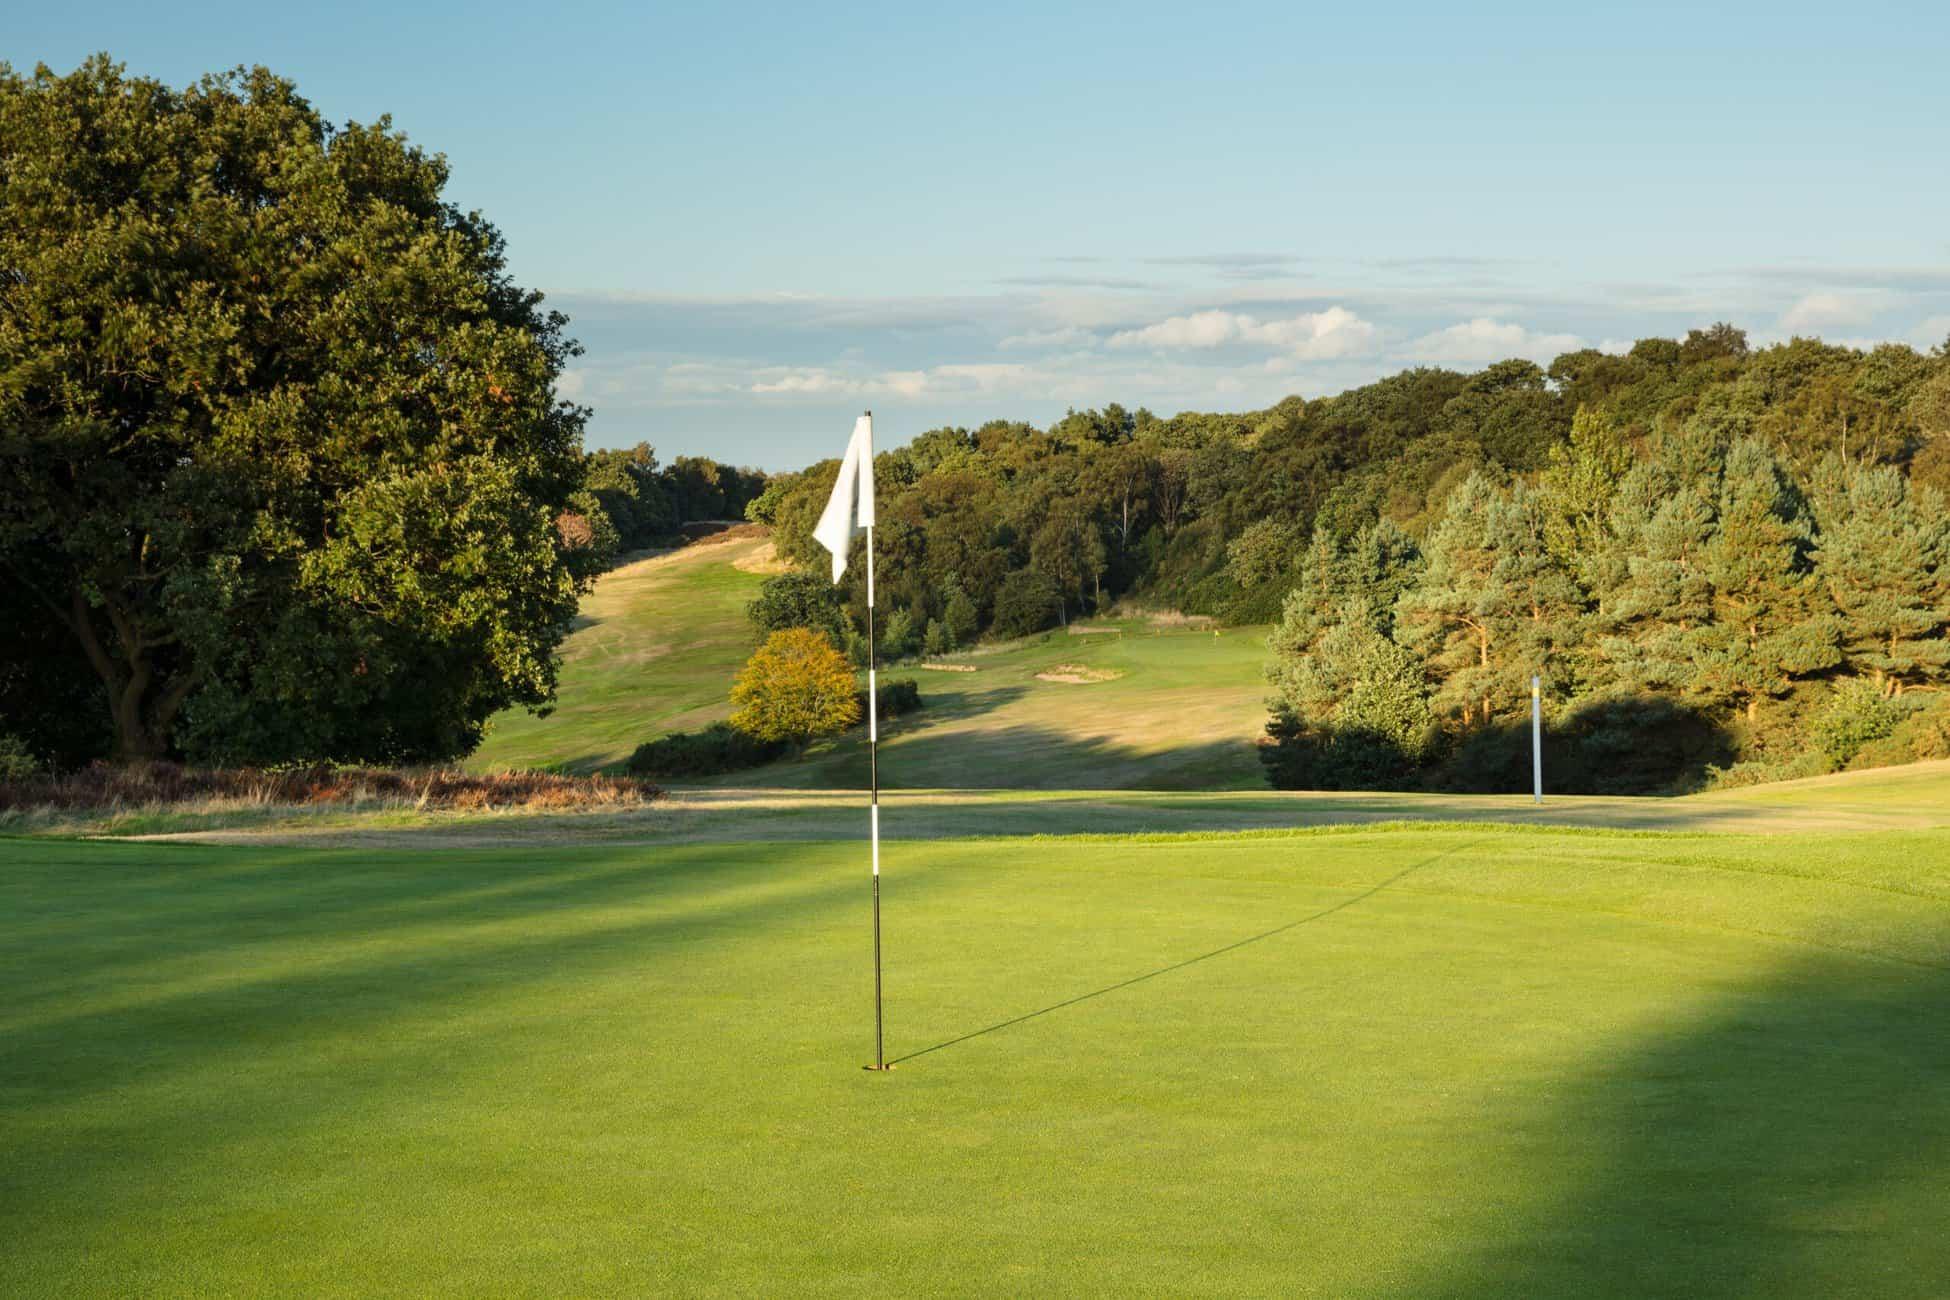 The Hallamshire Golf Club